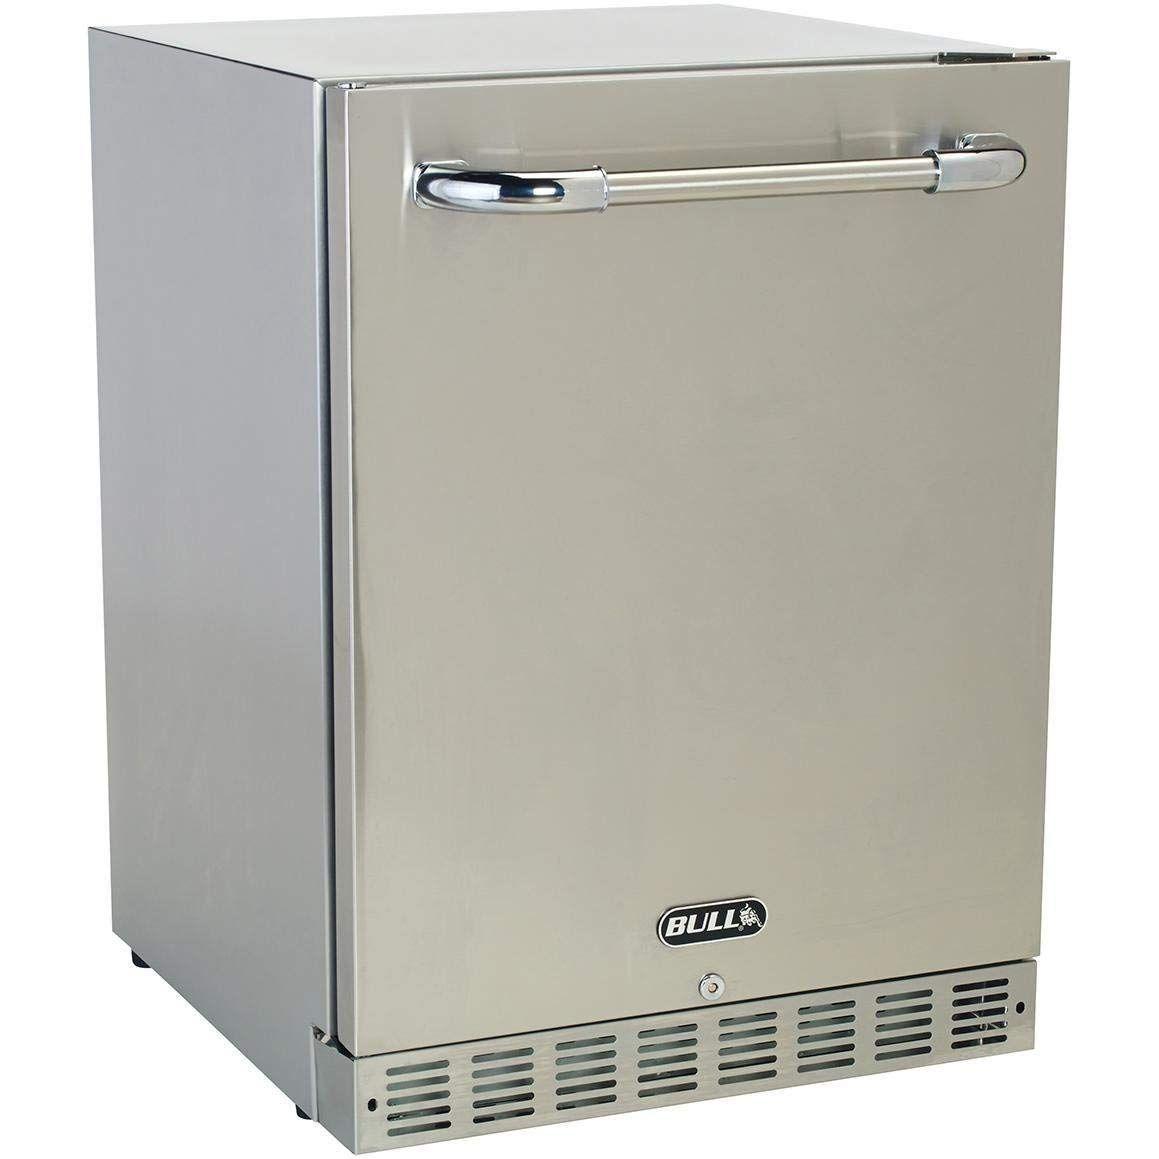 7 Best Outdoor Refrigerators Plus 2 To Avoid 2020 Buyers Guide Freshnss Outdoor Refrigerator Outdoor Fridge Outdoor Kitchen Appliances